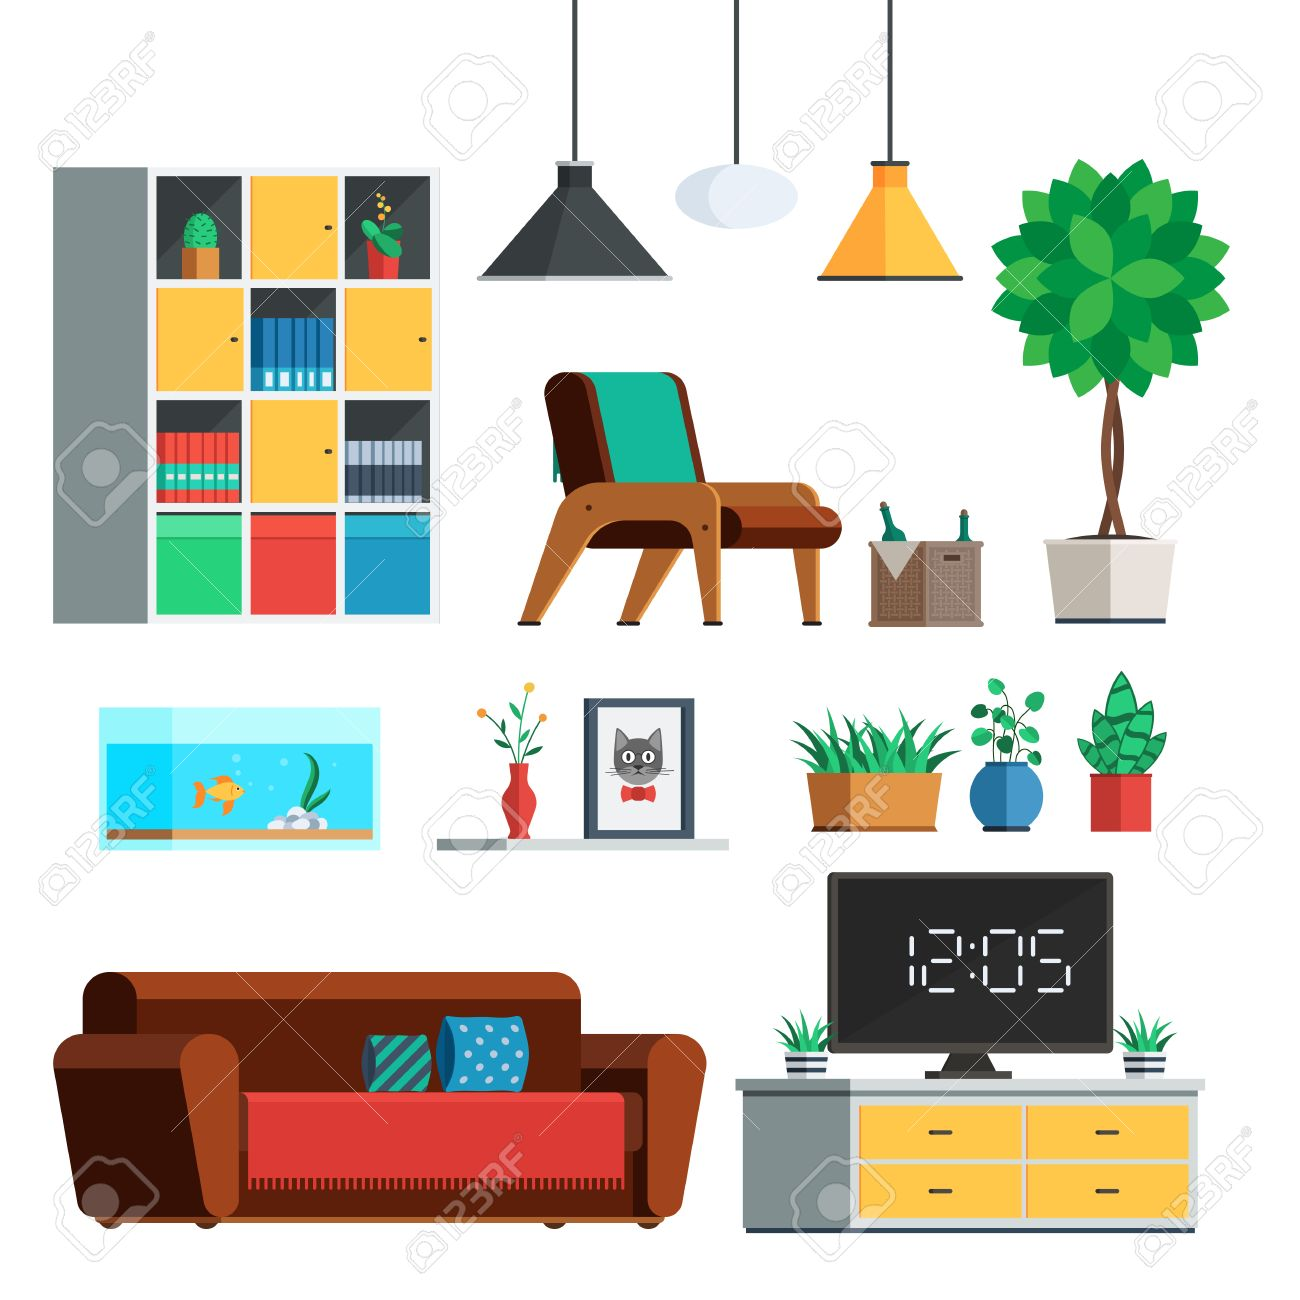 Living Room Lamp Wardrobe Plants Sofa TV